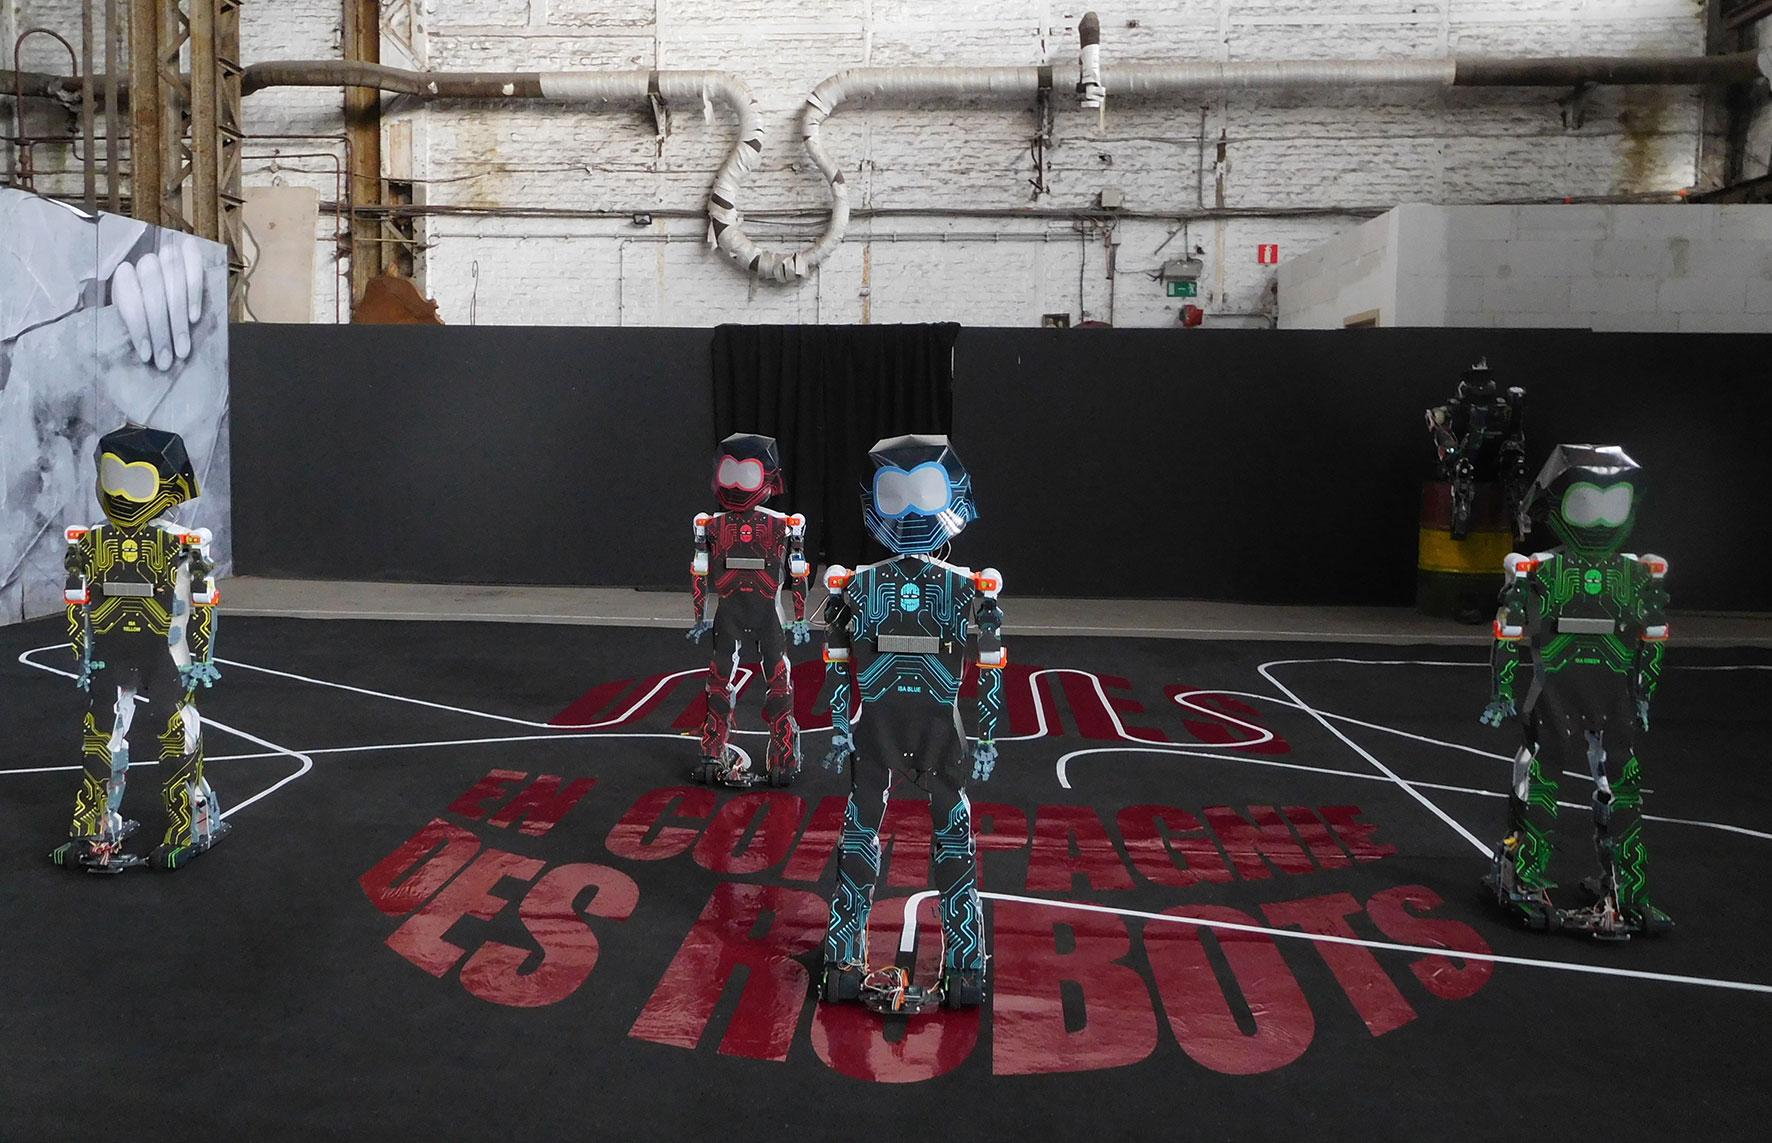 Utopies-en-compagnie-des-robots-ballet1